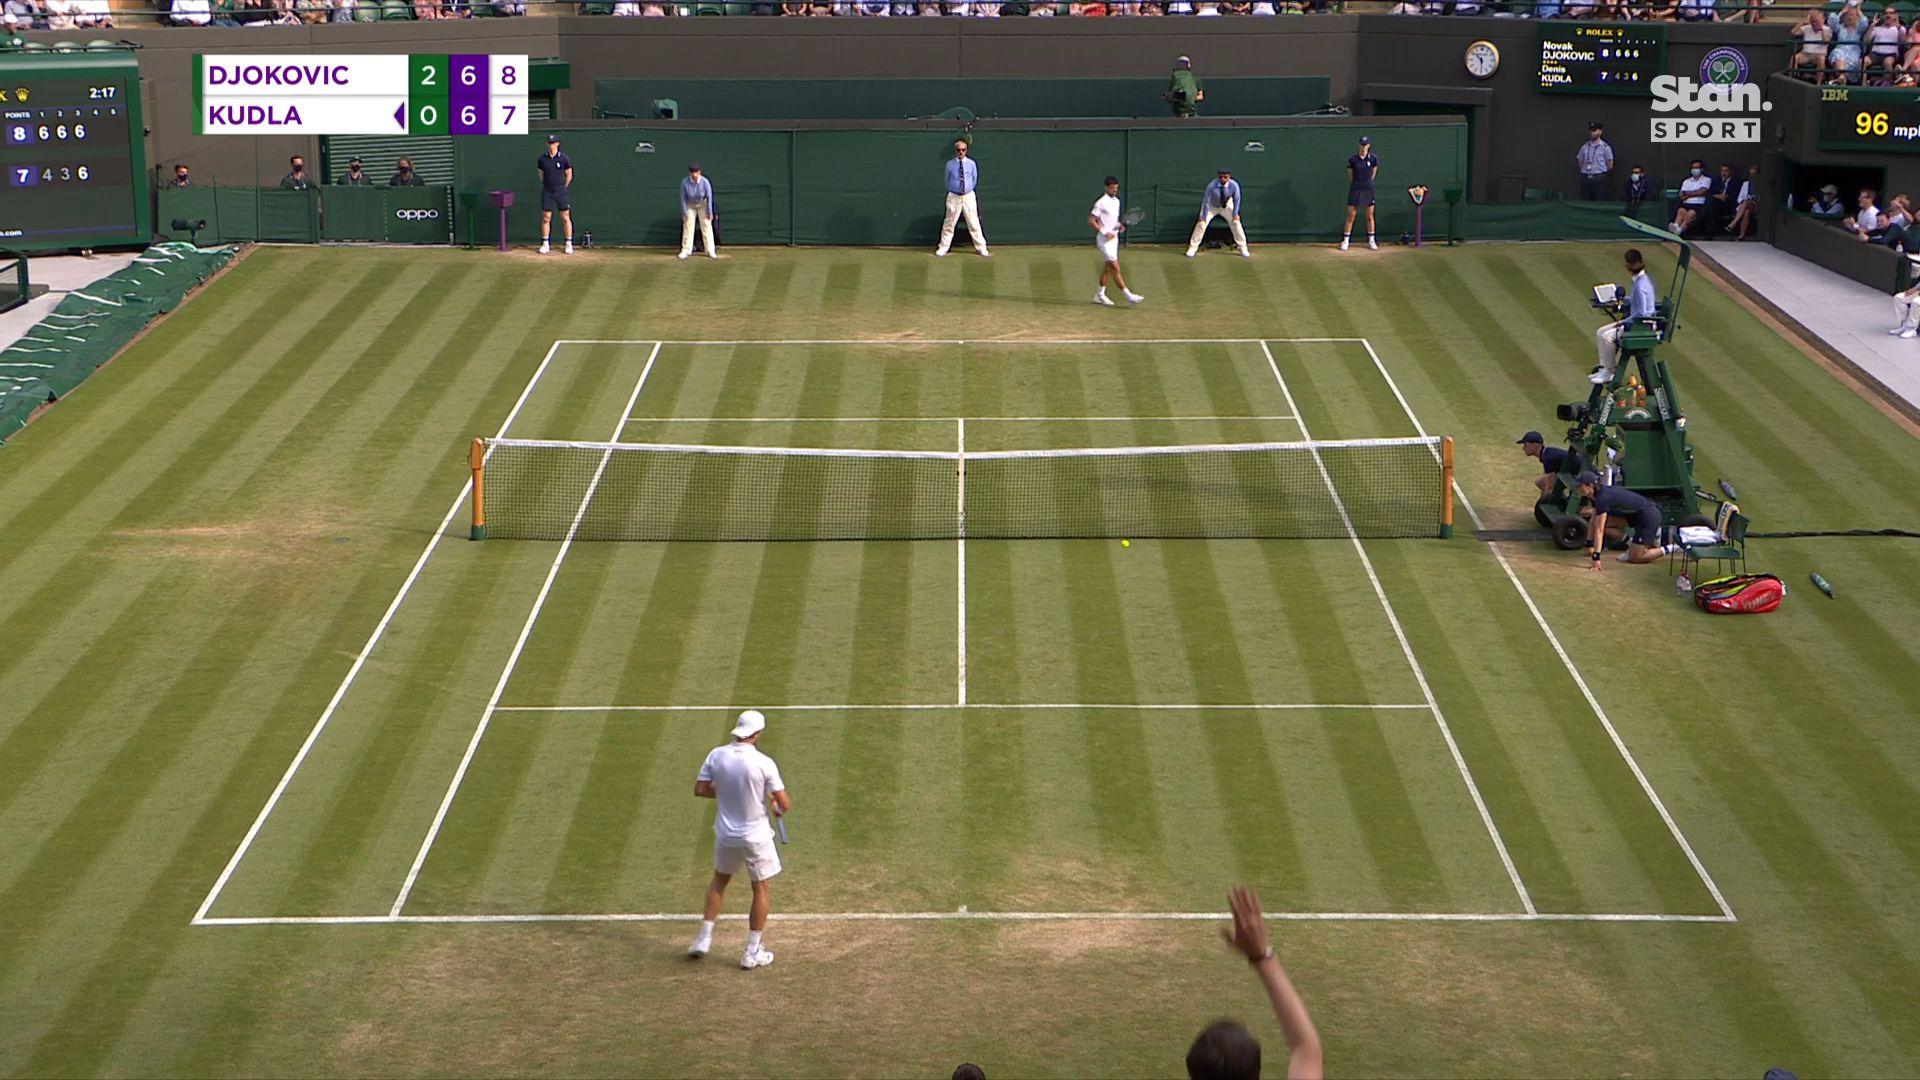 'Somehow I found a way' -- Novak Djokovic wins again at Wimbledon